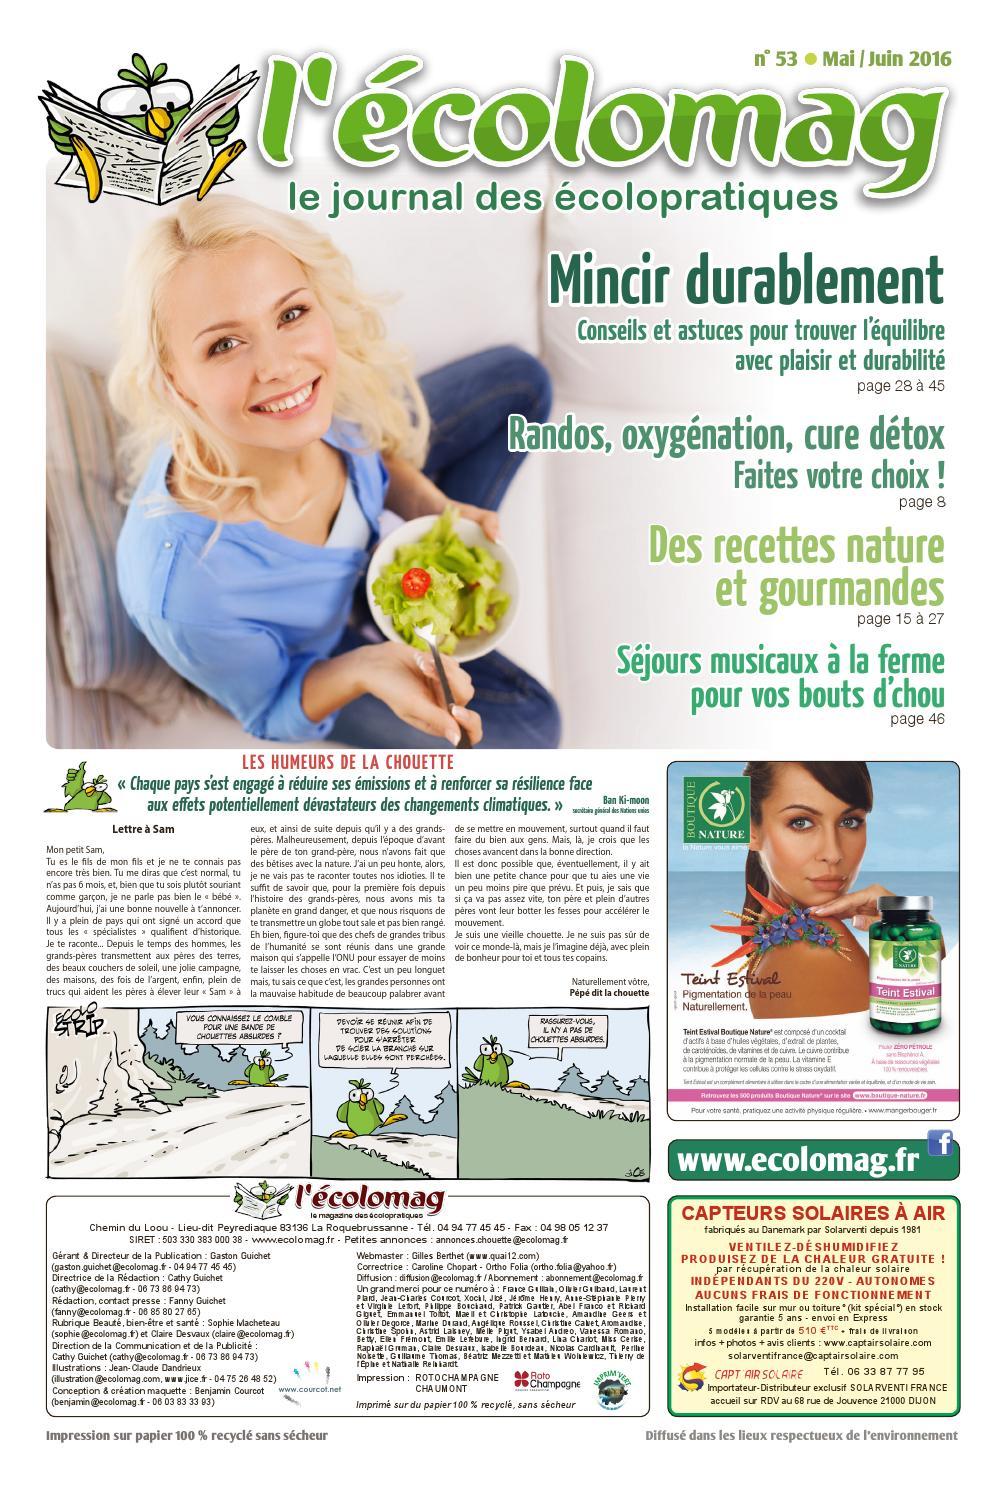 L Ecolomag n°53 by L Ecolomag - issuu 467581256fa0